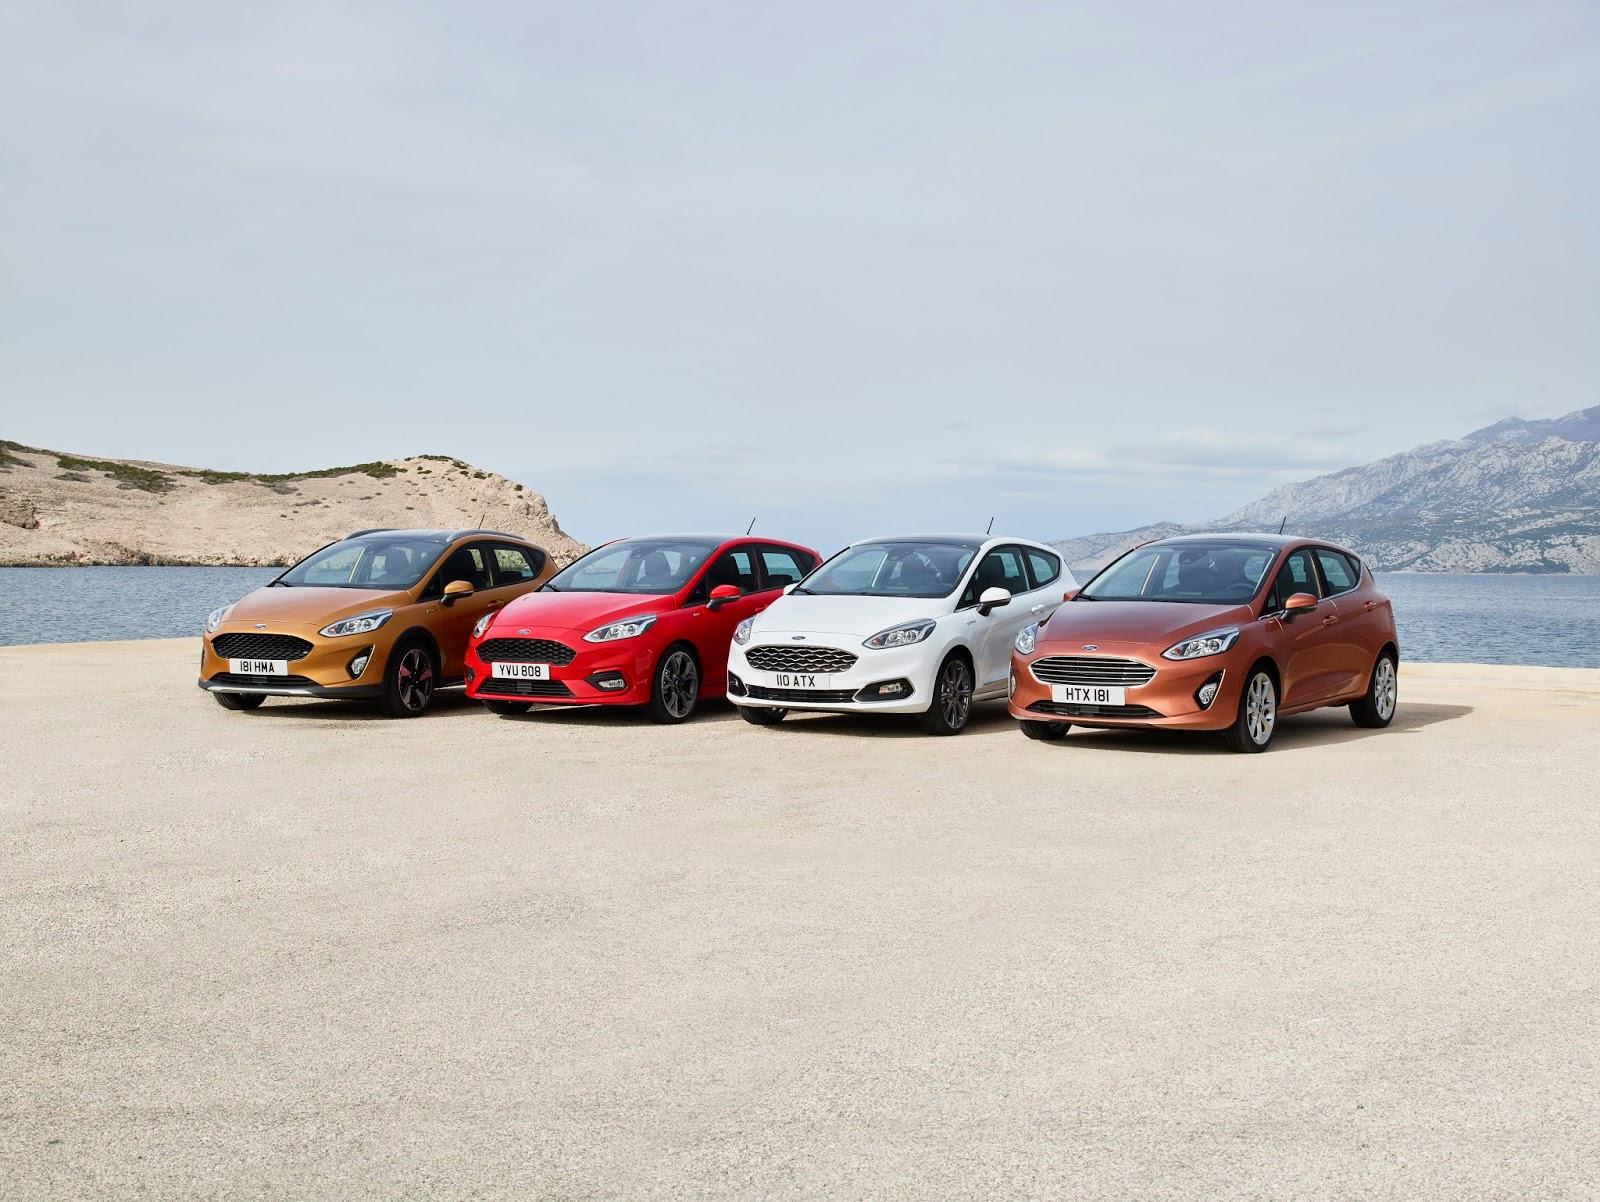 FORD FIESTA2016 RANGE 01 LOW Έρχεται το νέο Ford Fiesta, όμως το παλιό πουλάει σαν τρελό Bestseller, Ford, Ford Fiesta, Sales, videos, Εργοστάσιο, πωλήσεις, πωλήσεις αυτοκινήτων